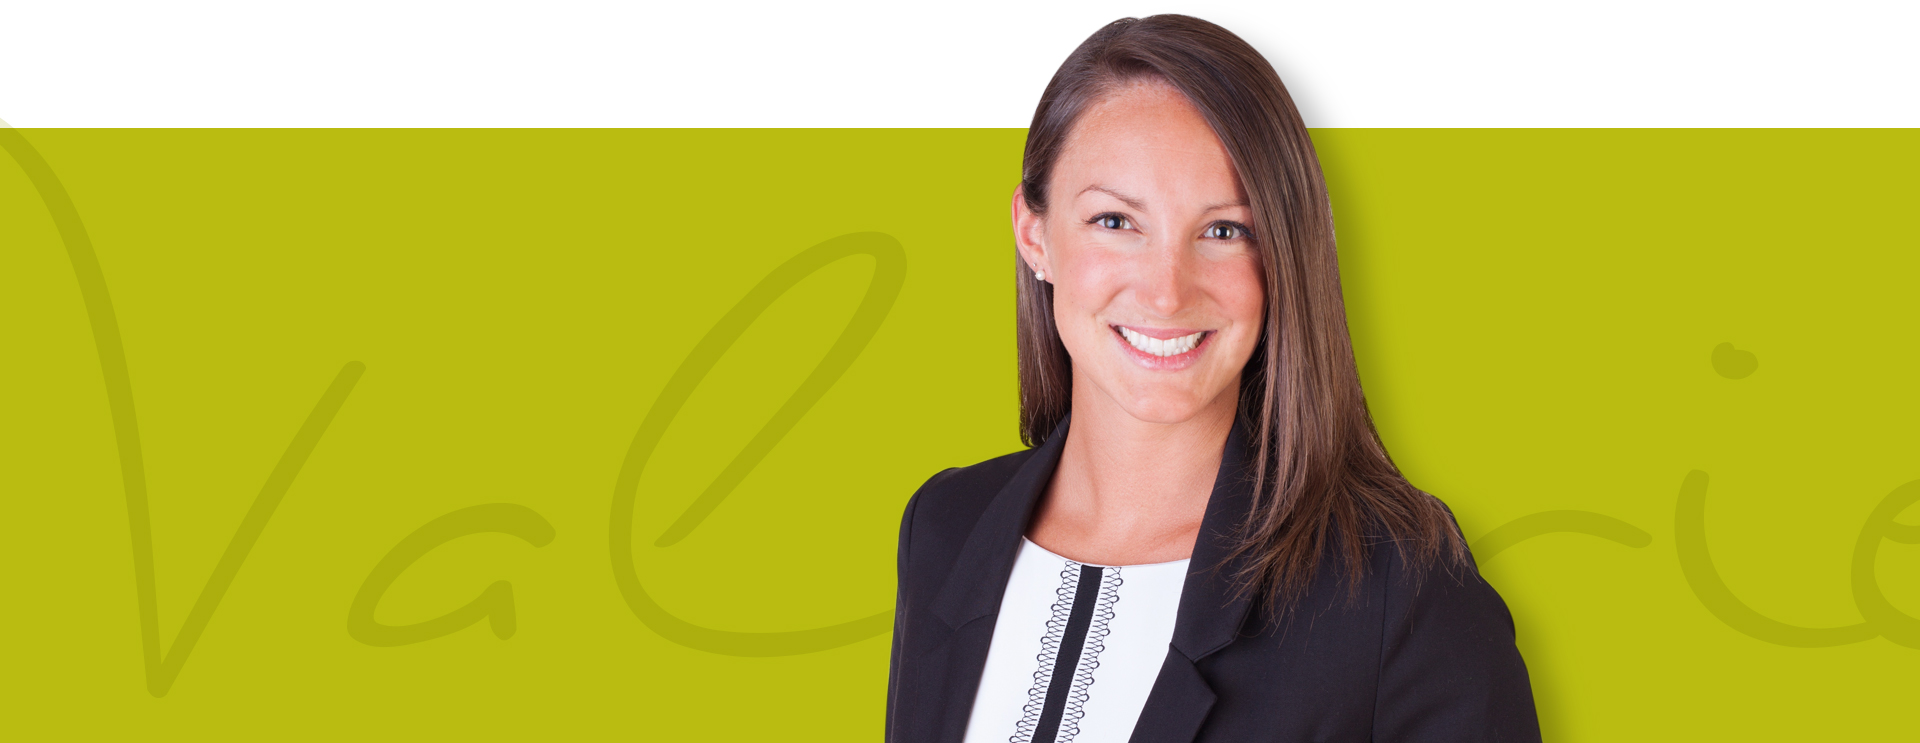 Valerie-bertrand-perreault-orthotherapeute-header